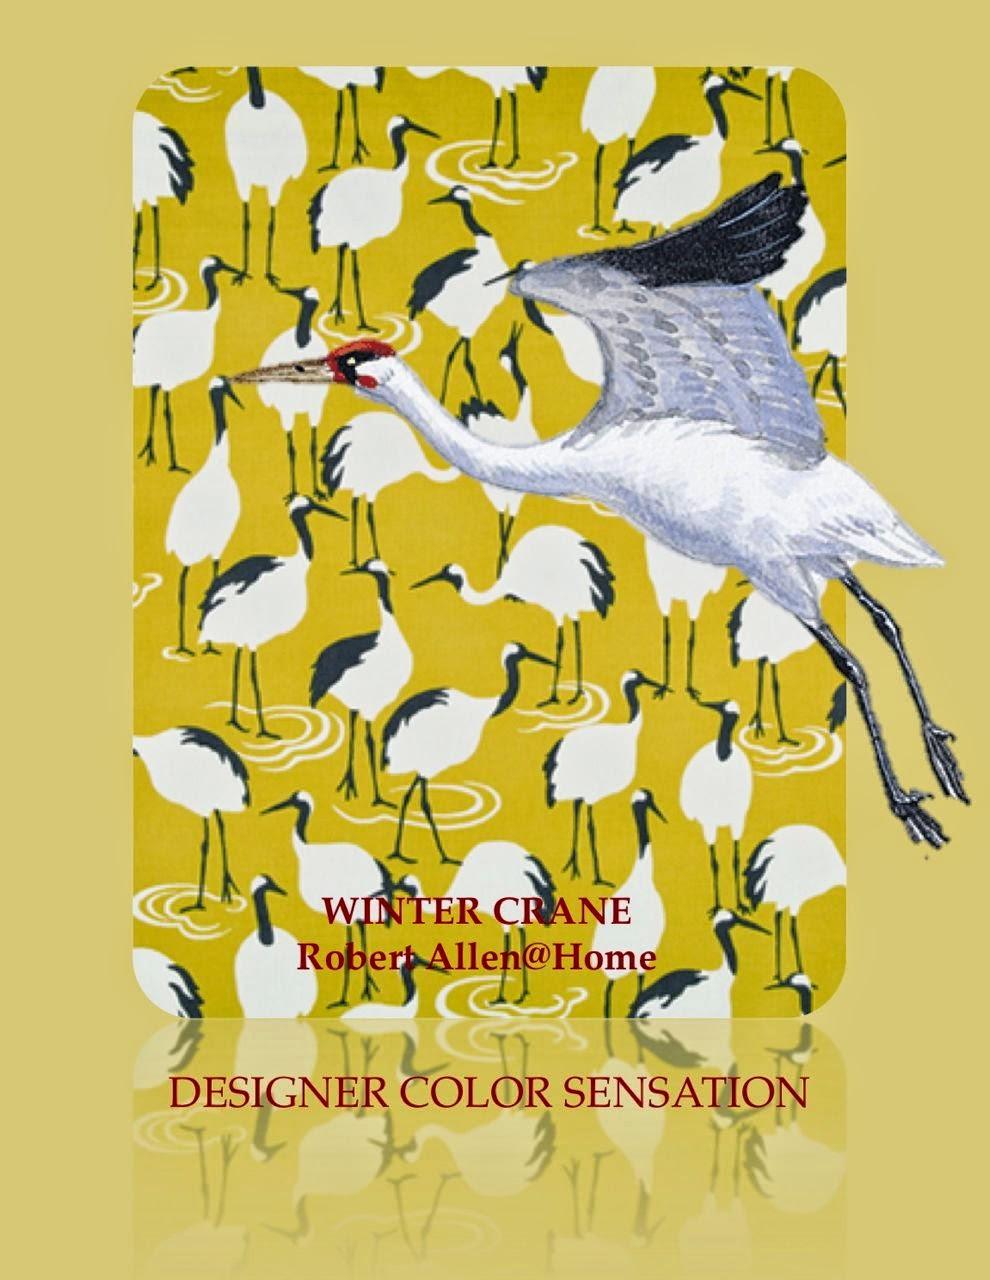 Crane Birds Symbolize Happiness and Smooth Flight